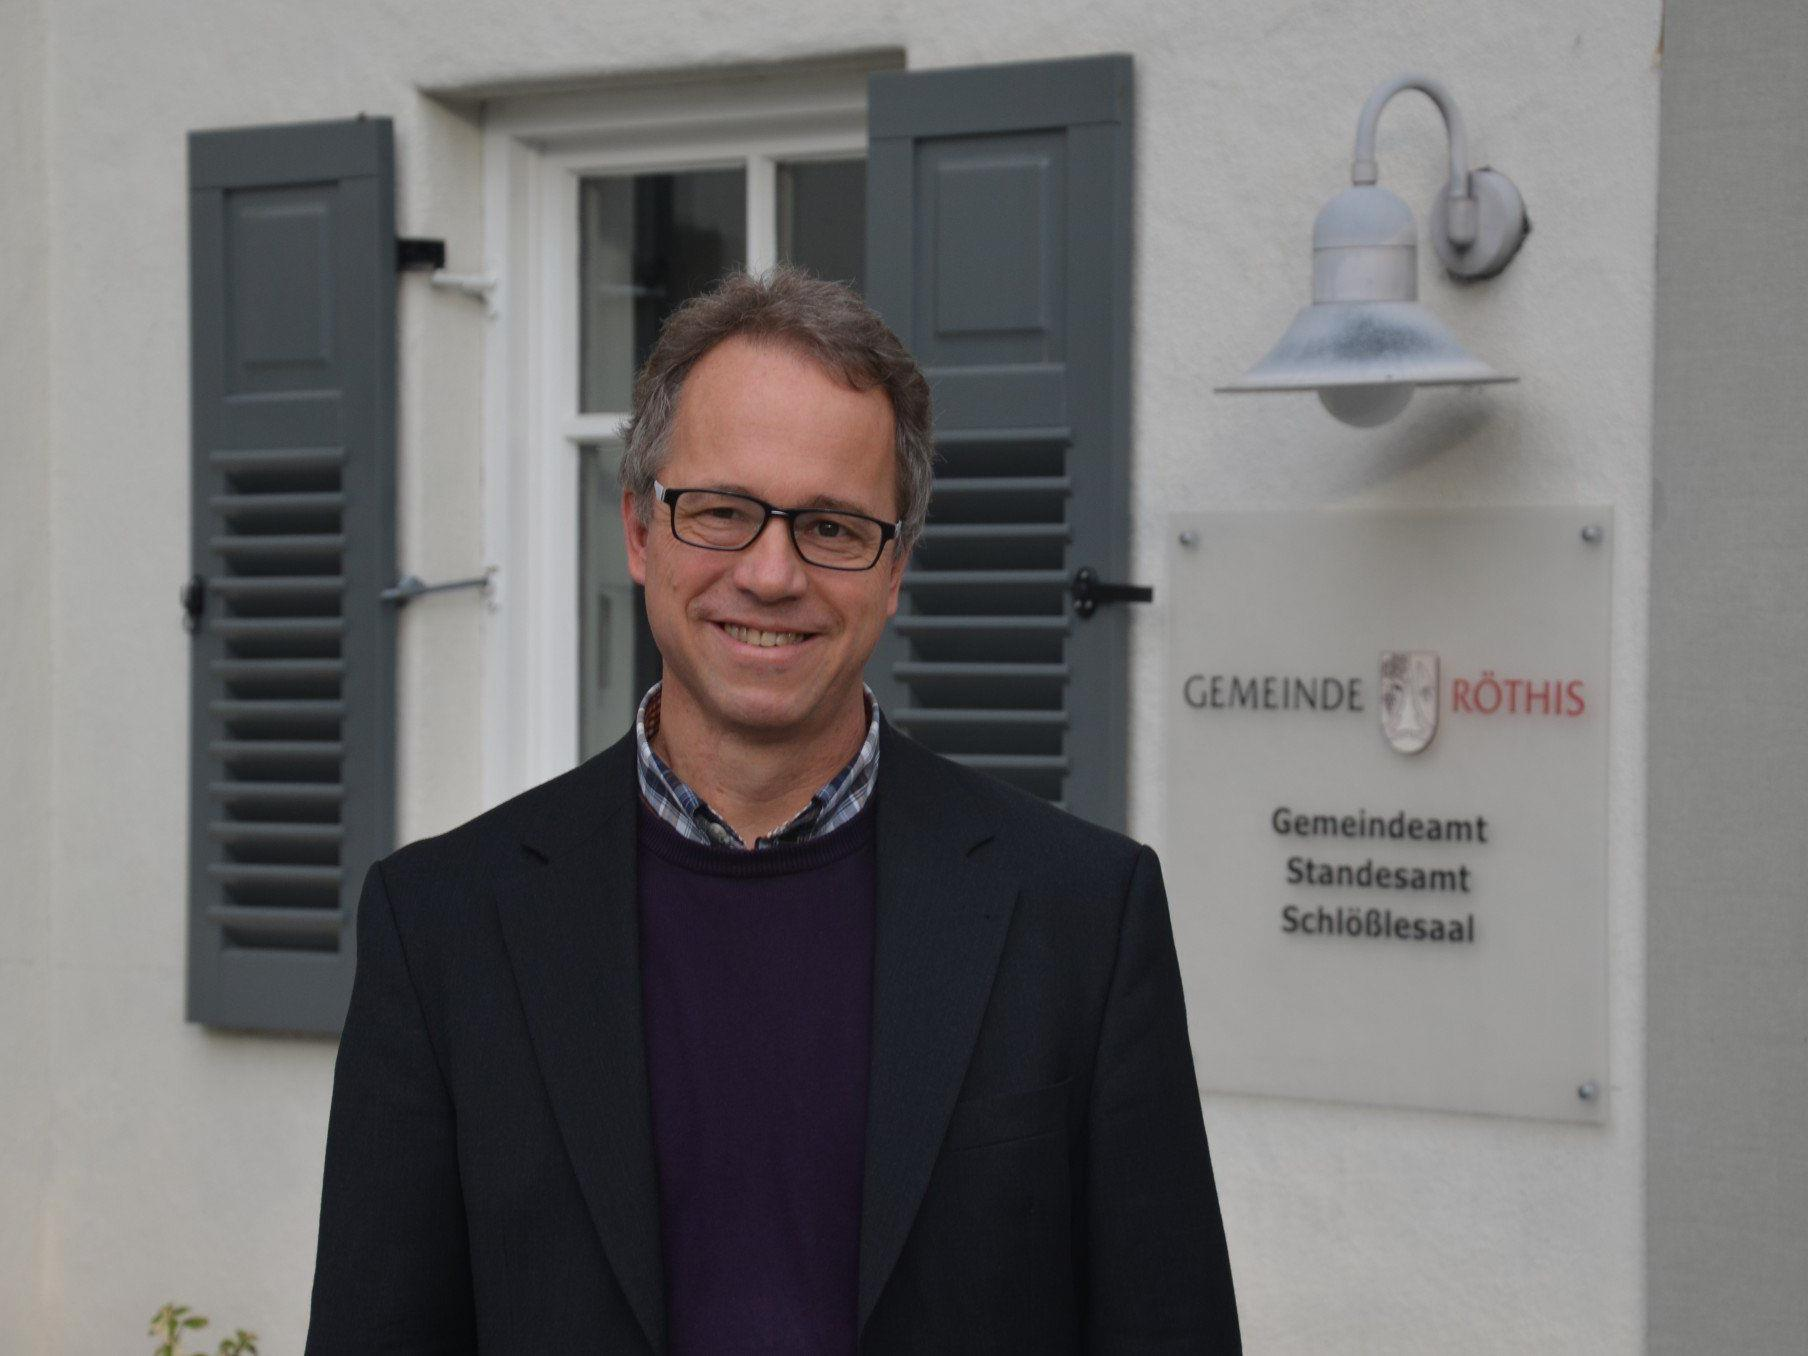 Roman Kopf ab Jänner der neue Bürgermeister von Röthis